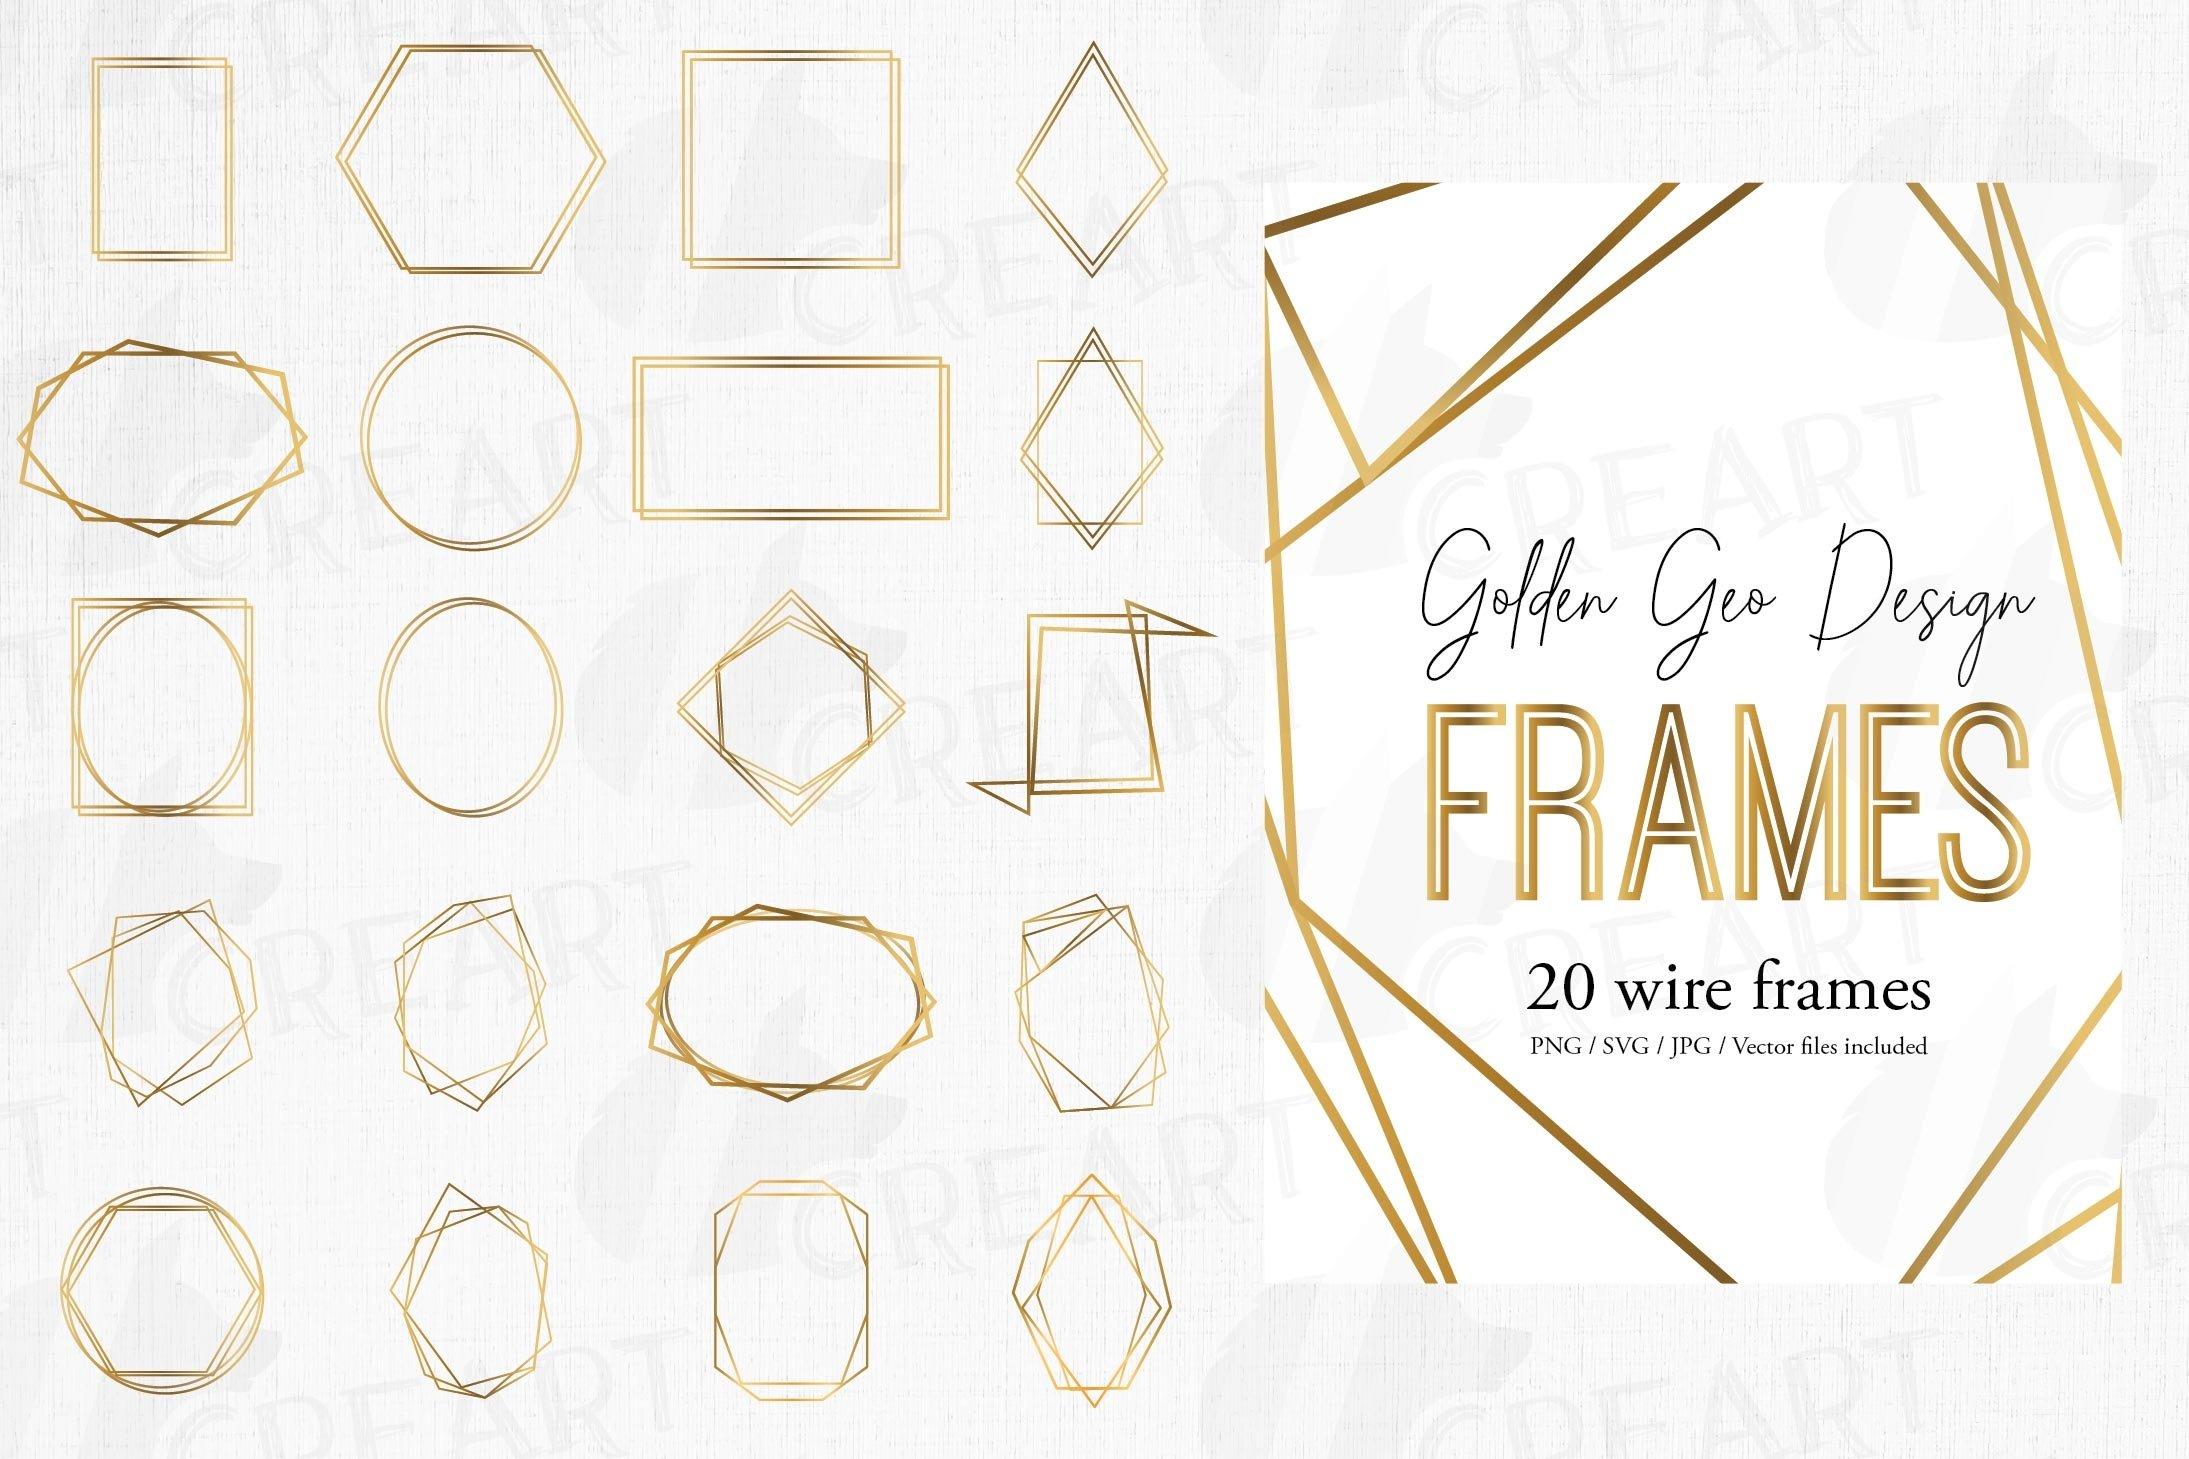 Download Golden Geometric Frames Clip Art Wedding Invite Geo Borders 460683 Illustrations Design Bundles